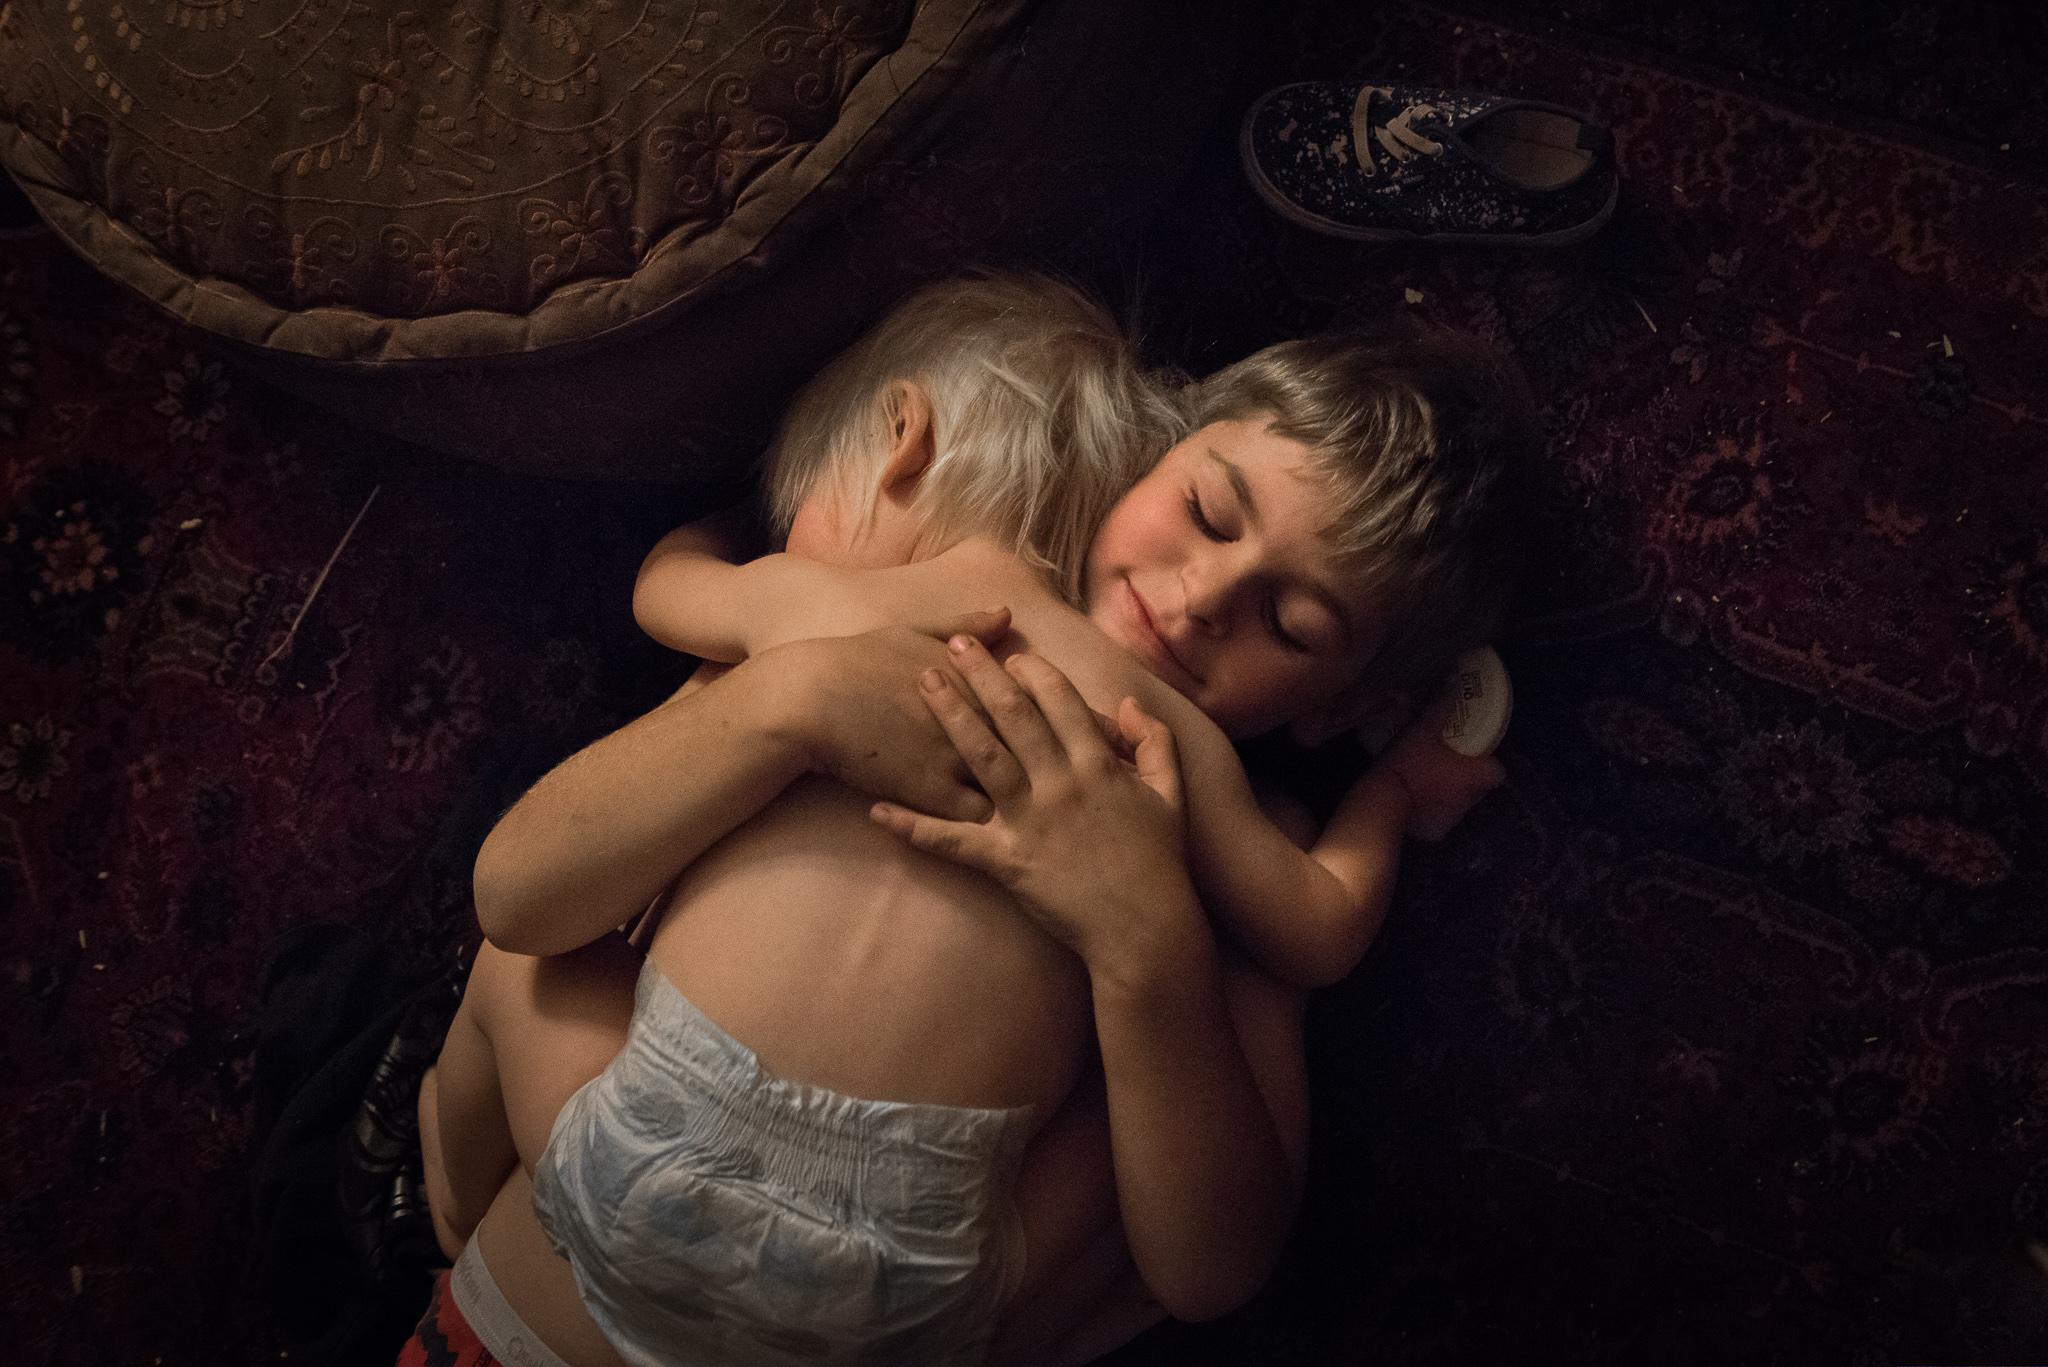 m hugging j IG-1.jpg